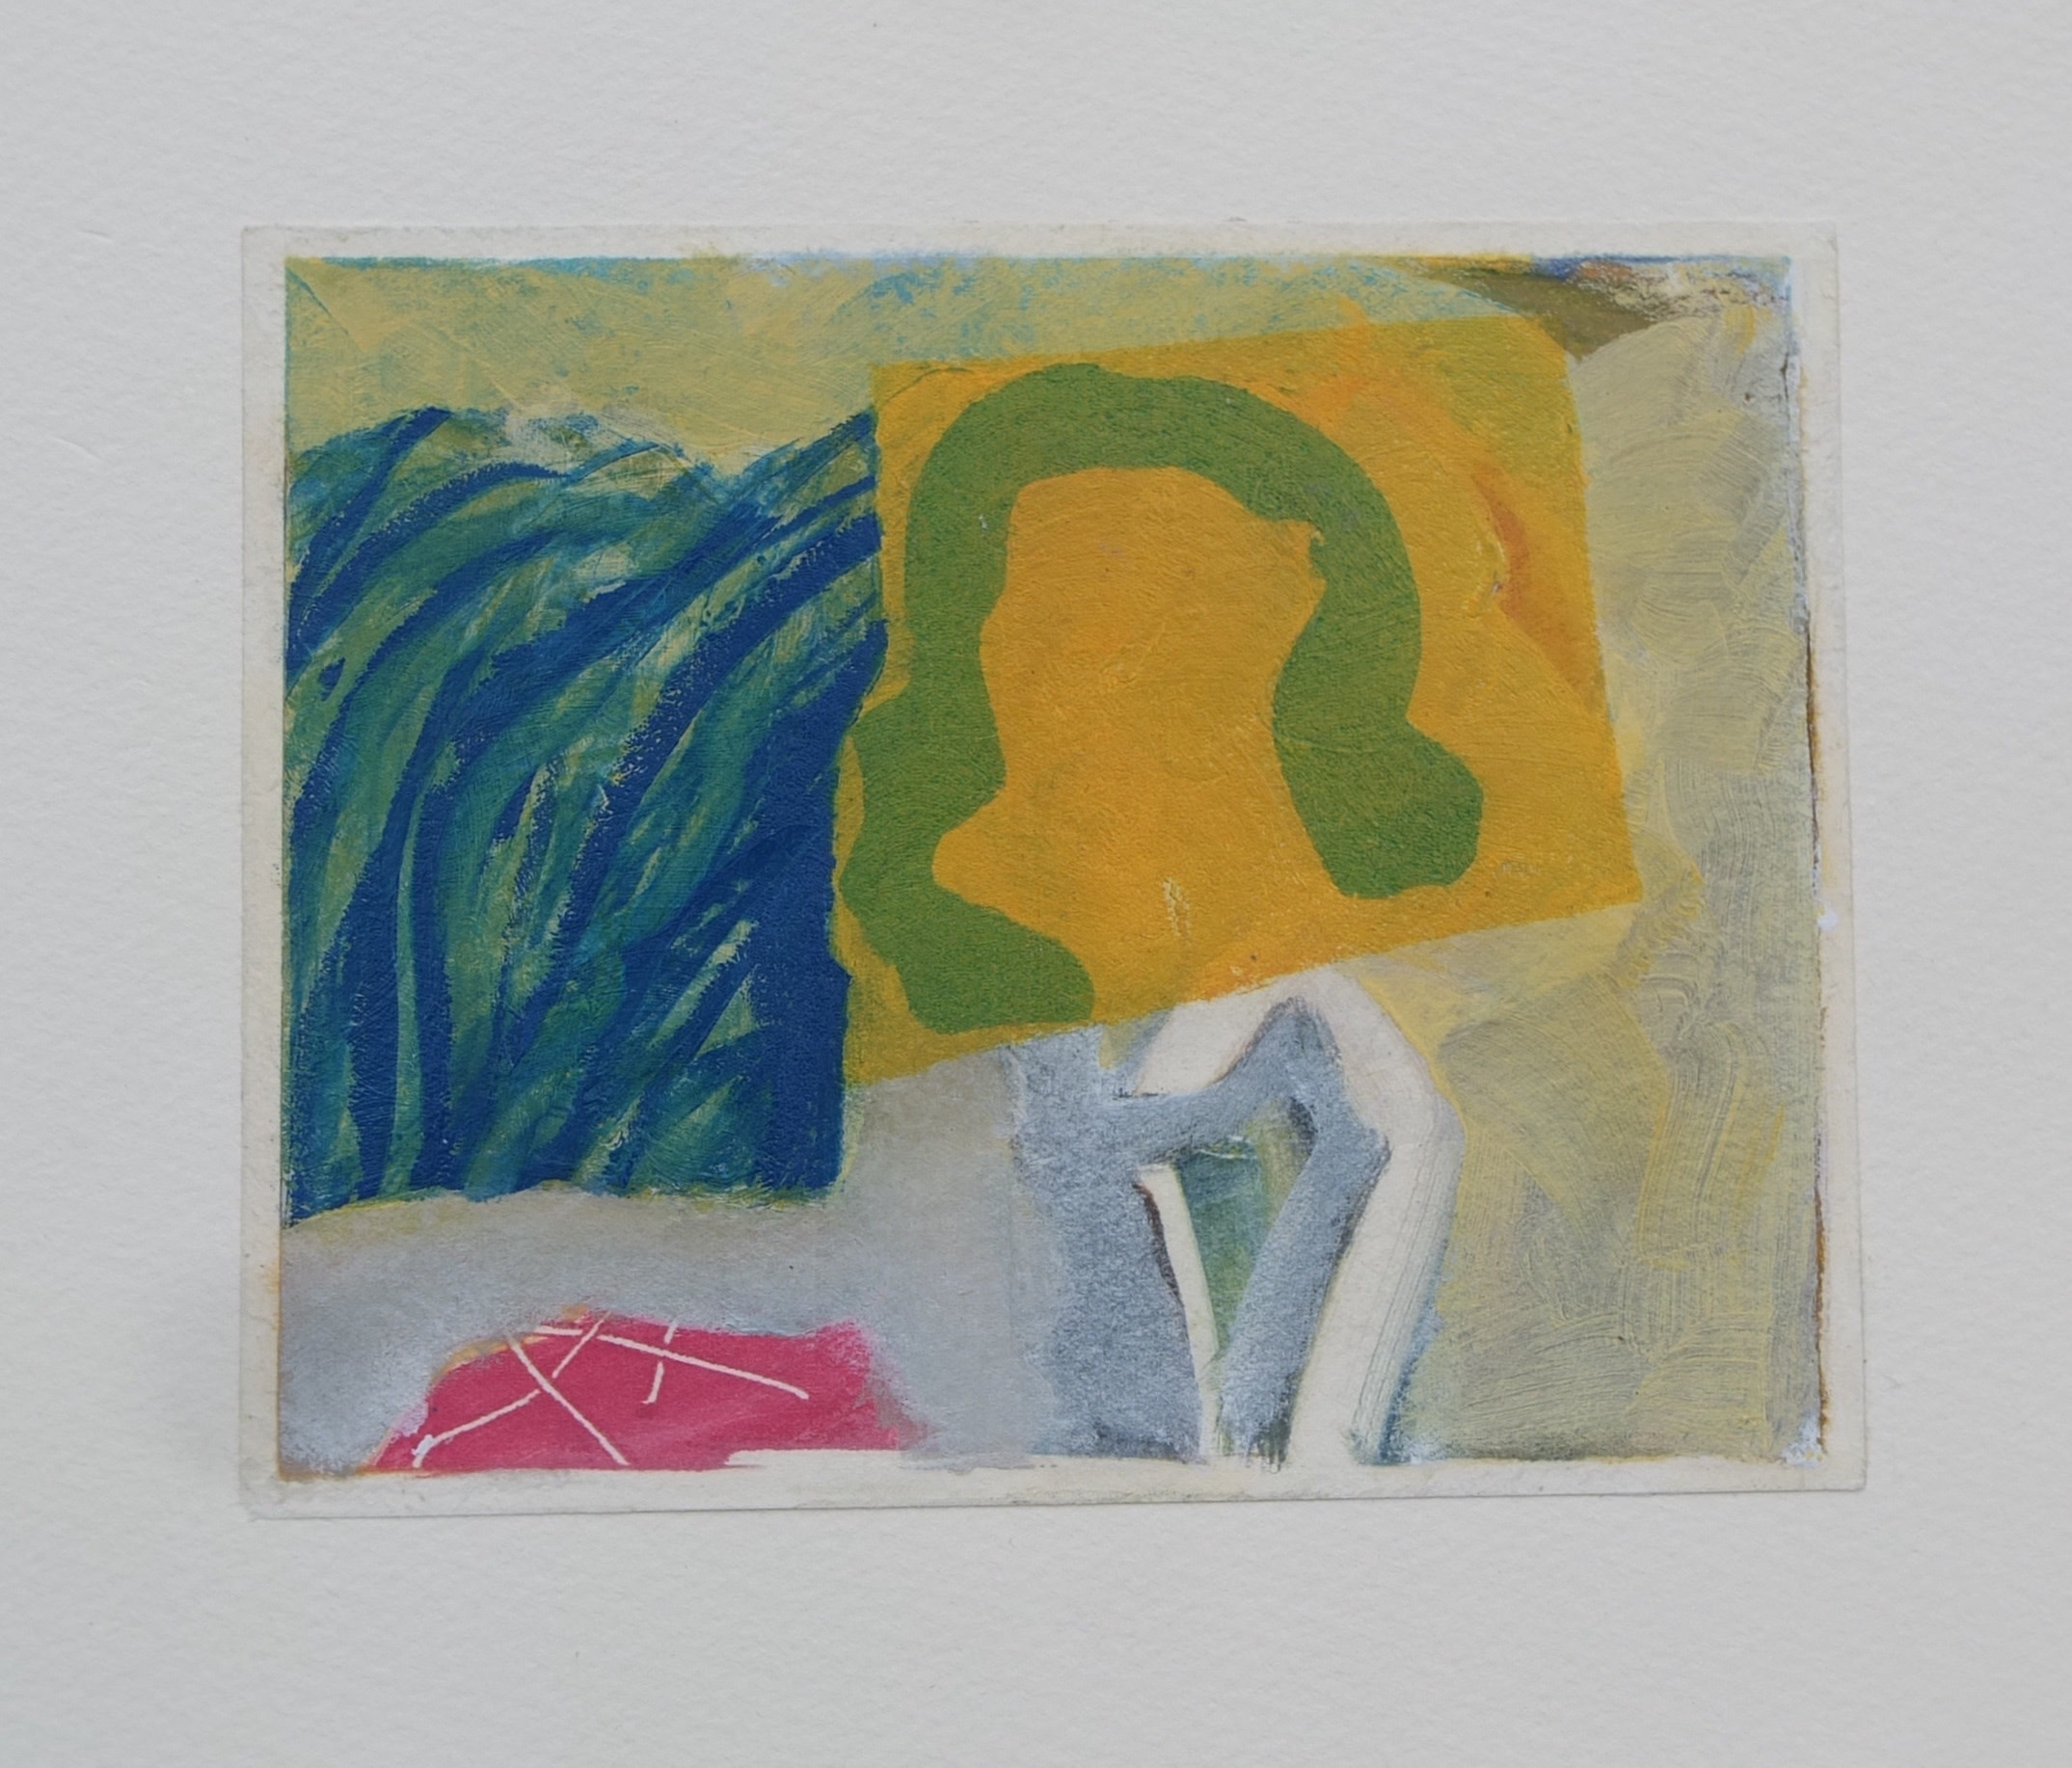 "<span class=""link fancybox-details-link""><a href=""/artists/32-robert-baggaley-re/works/10282/"">View Detail Page</a></span><div class=""artist""><span class=""artist""><strong>Robert Baggaley RE</strong></span></div><div class=""title""><em>St Agnes</em></div><div class=""medium"">monotype</div><div class=""dimensions"">33 x 34cm framed size</div><div class=""price"">£210.00</div>"